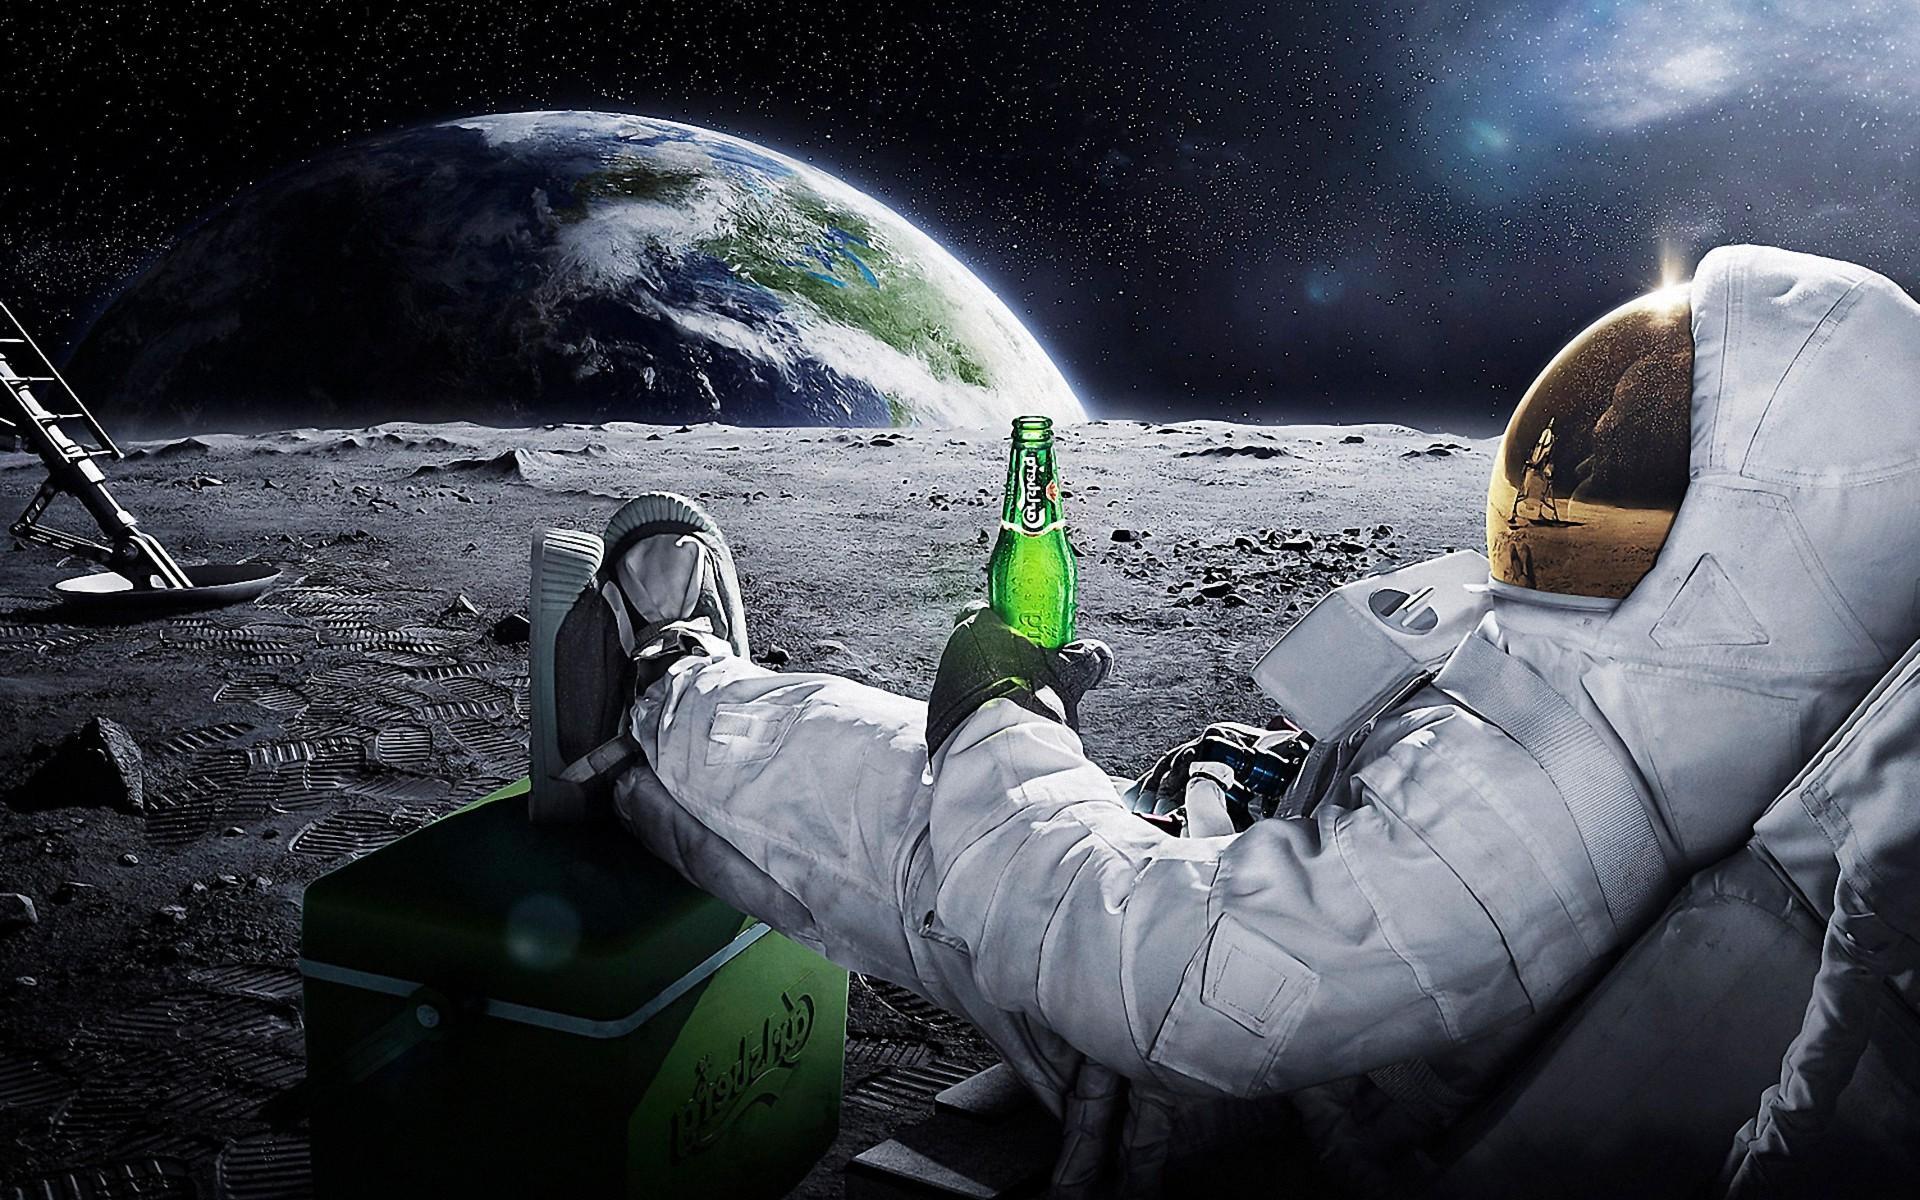 Wallpaper 1920x1200 Px Astronauts Beers Carlsberg